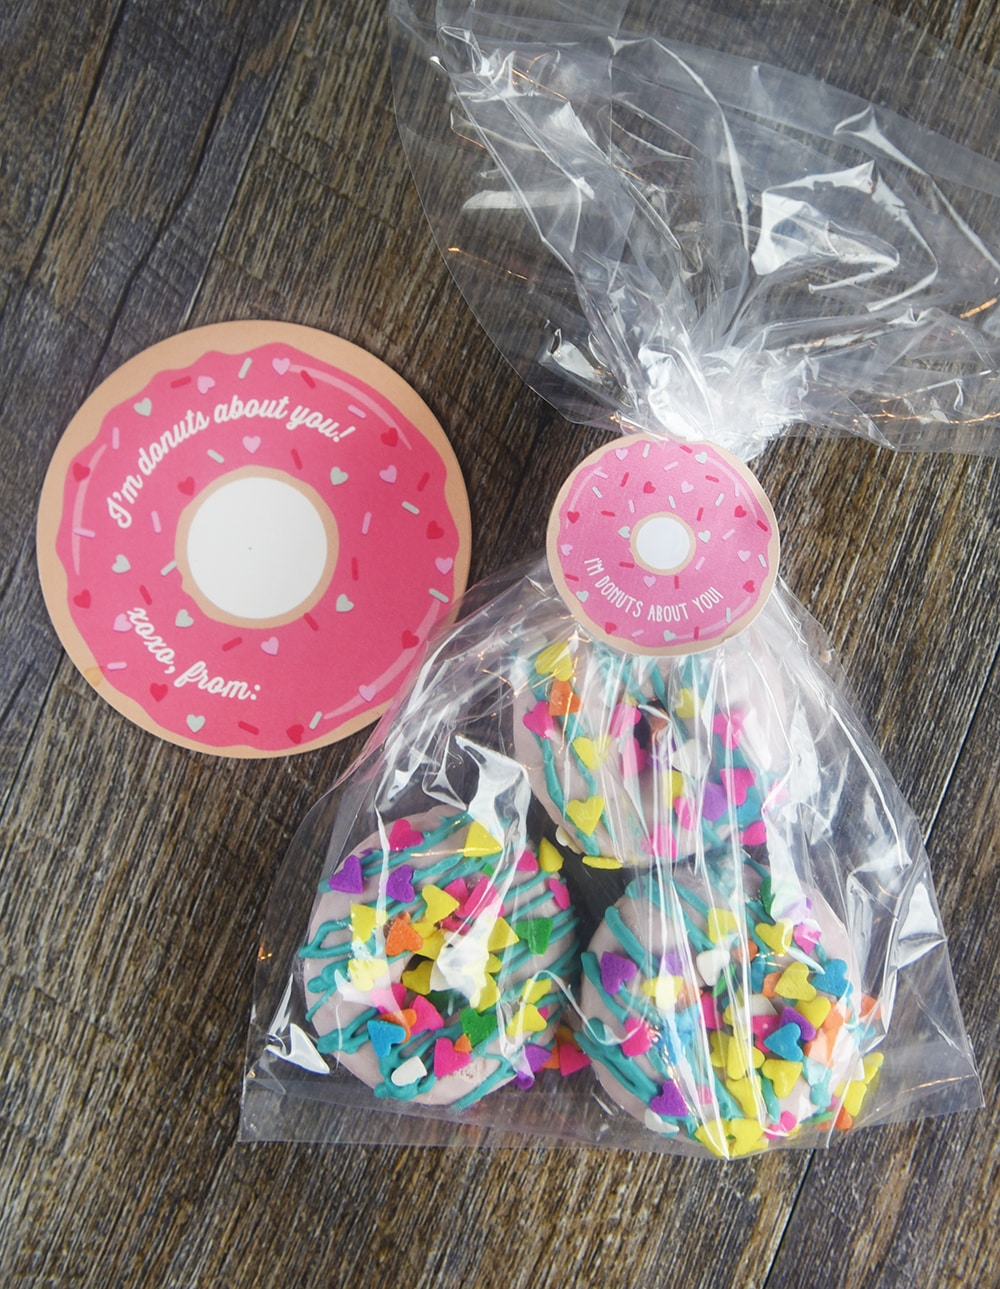 7 Super Cute Valentines. I'm donuts about you!